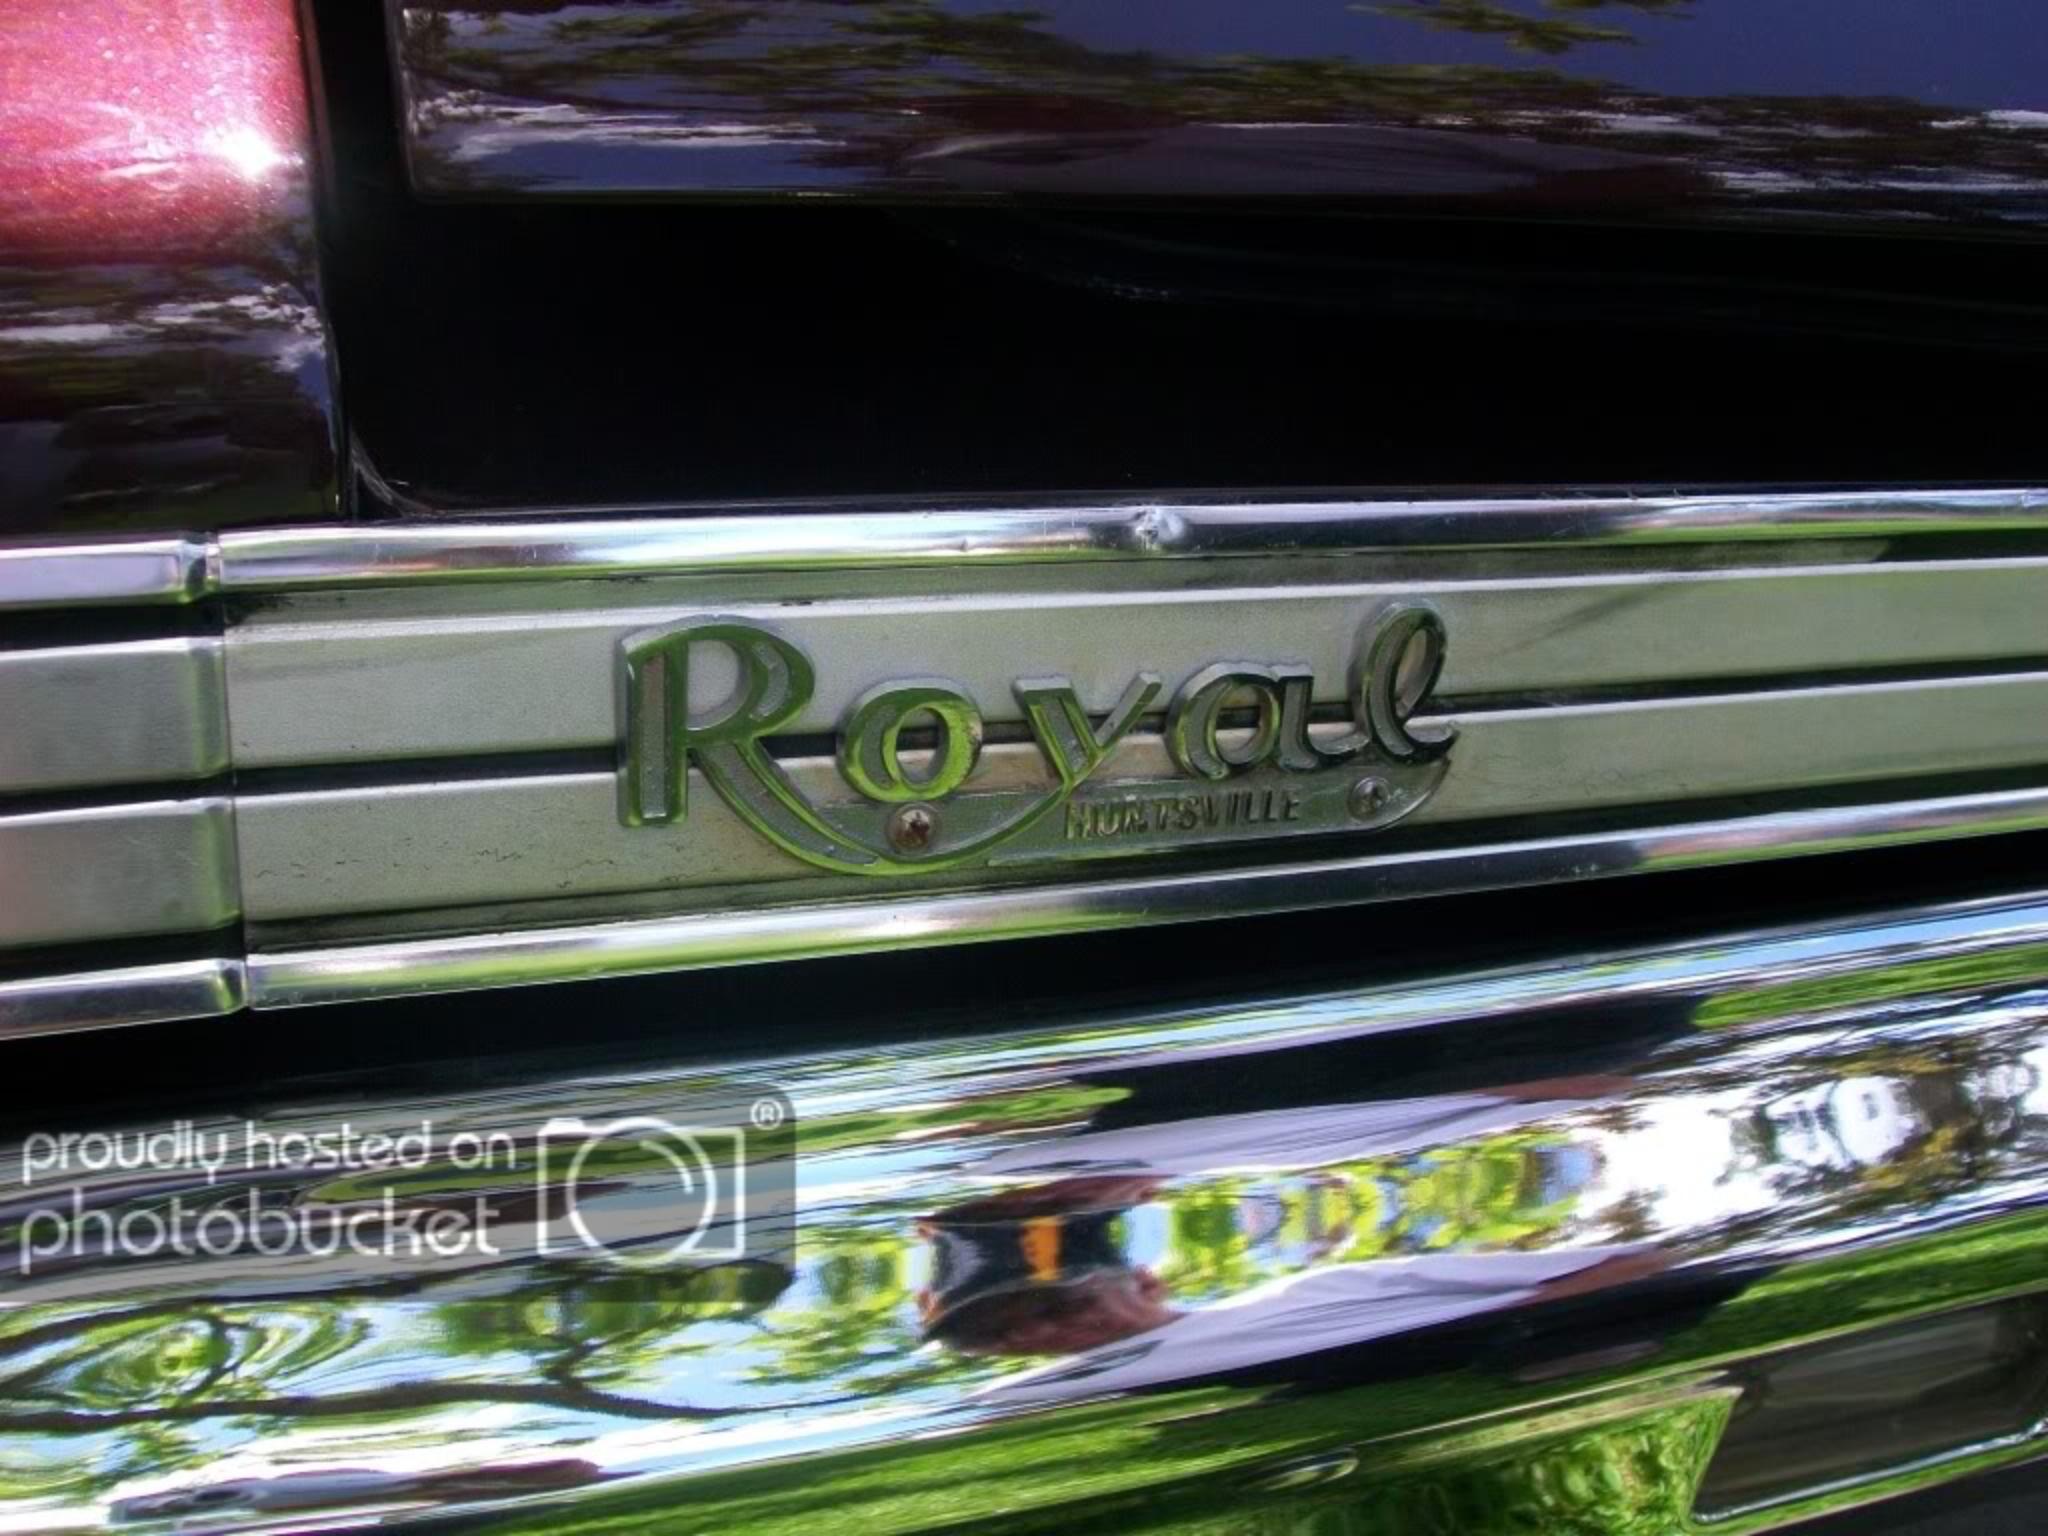 Royal Chevrolet Dealership, Huntsville, Alabama ...